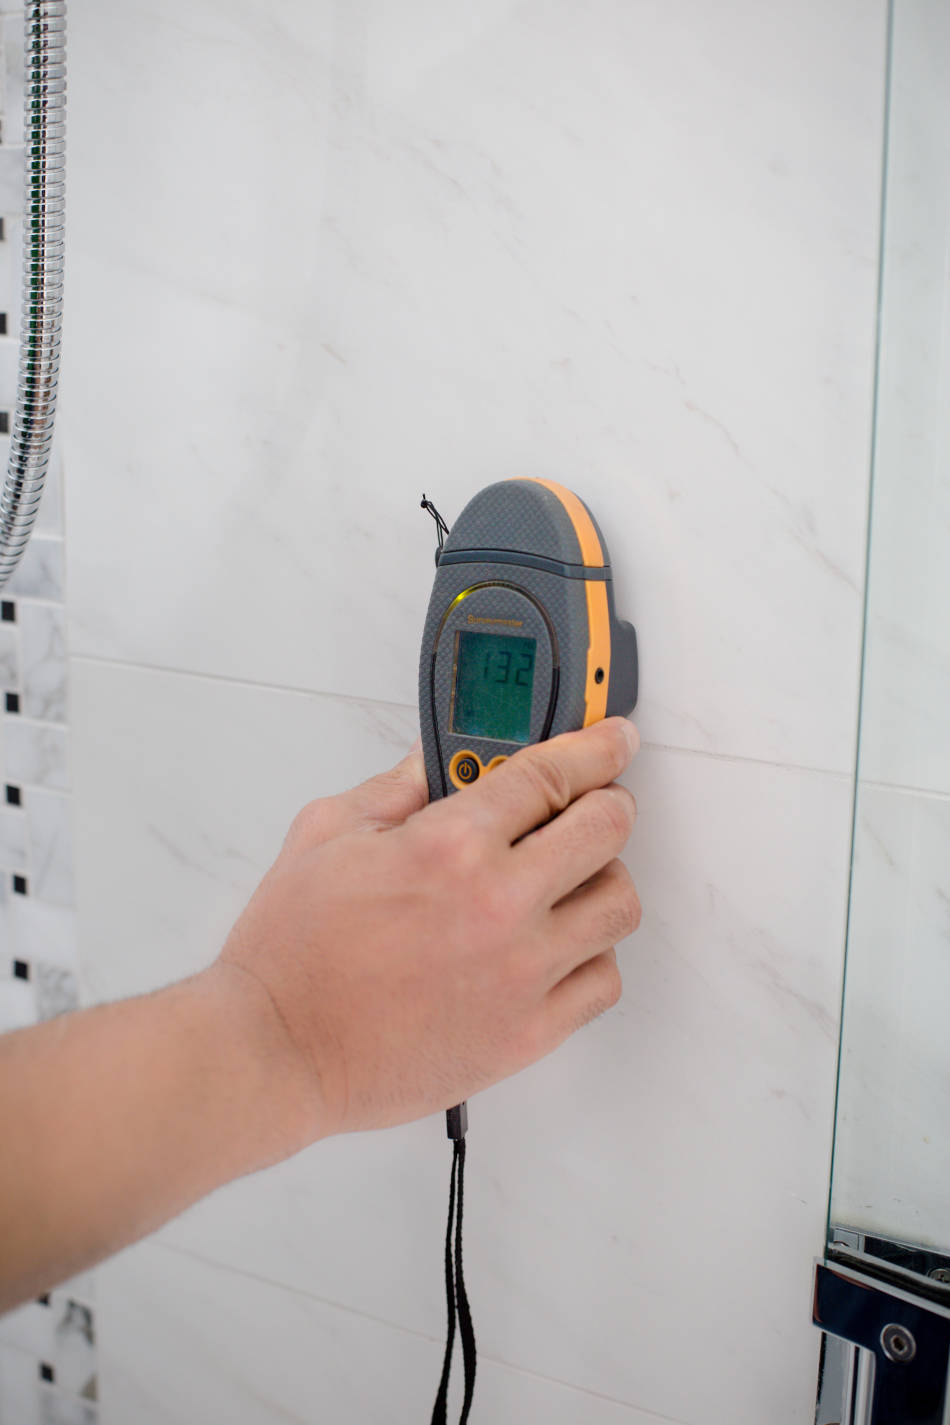 Home inspector measuring moisture